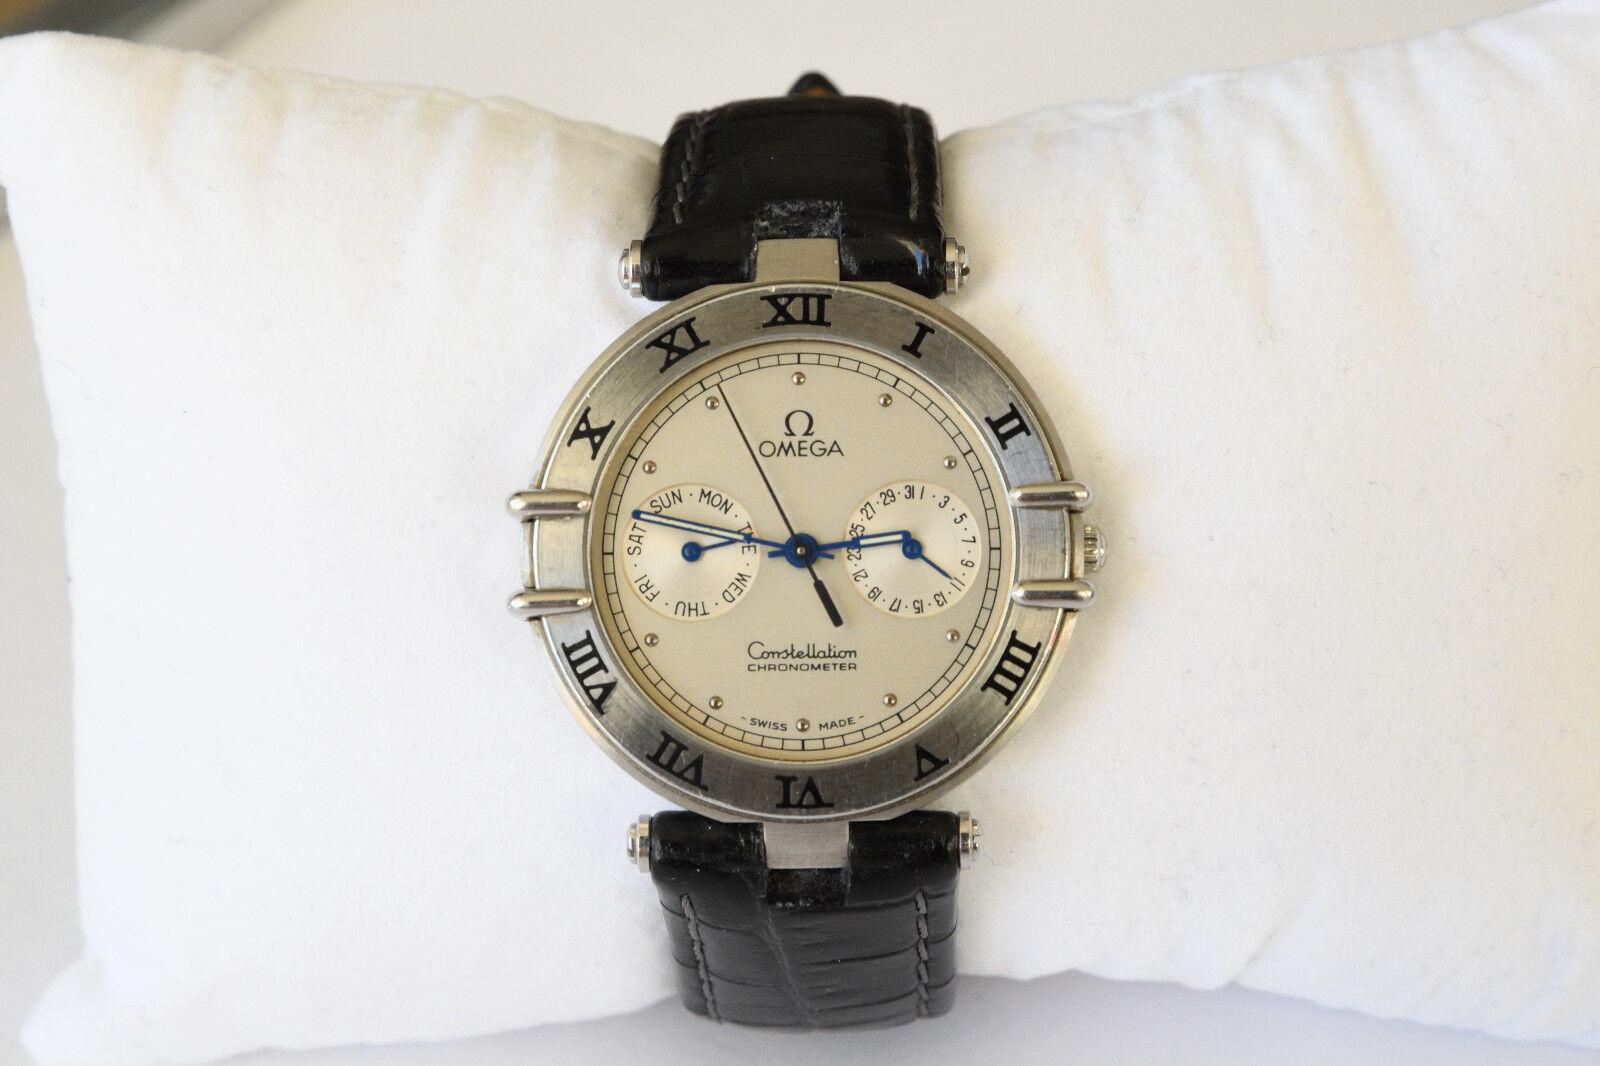 Omega Constellation Chronometer 1987